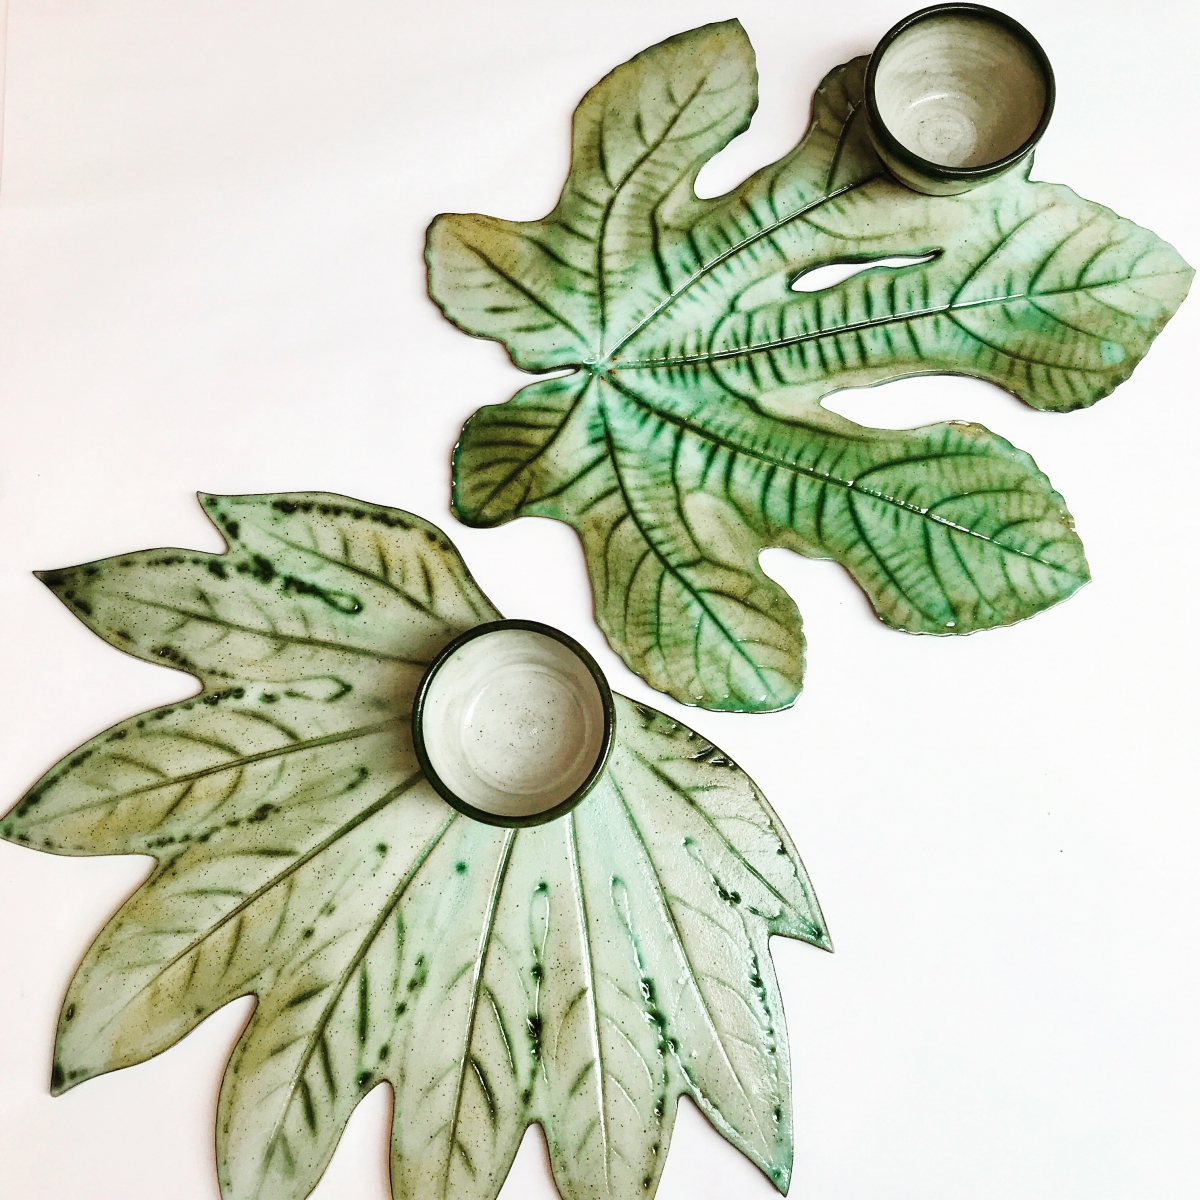 Large Leaf Sharing Platters by Sonya Ceramic Art 2 Designs